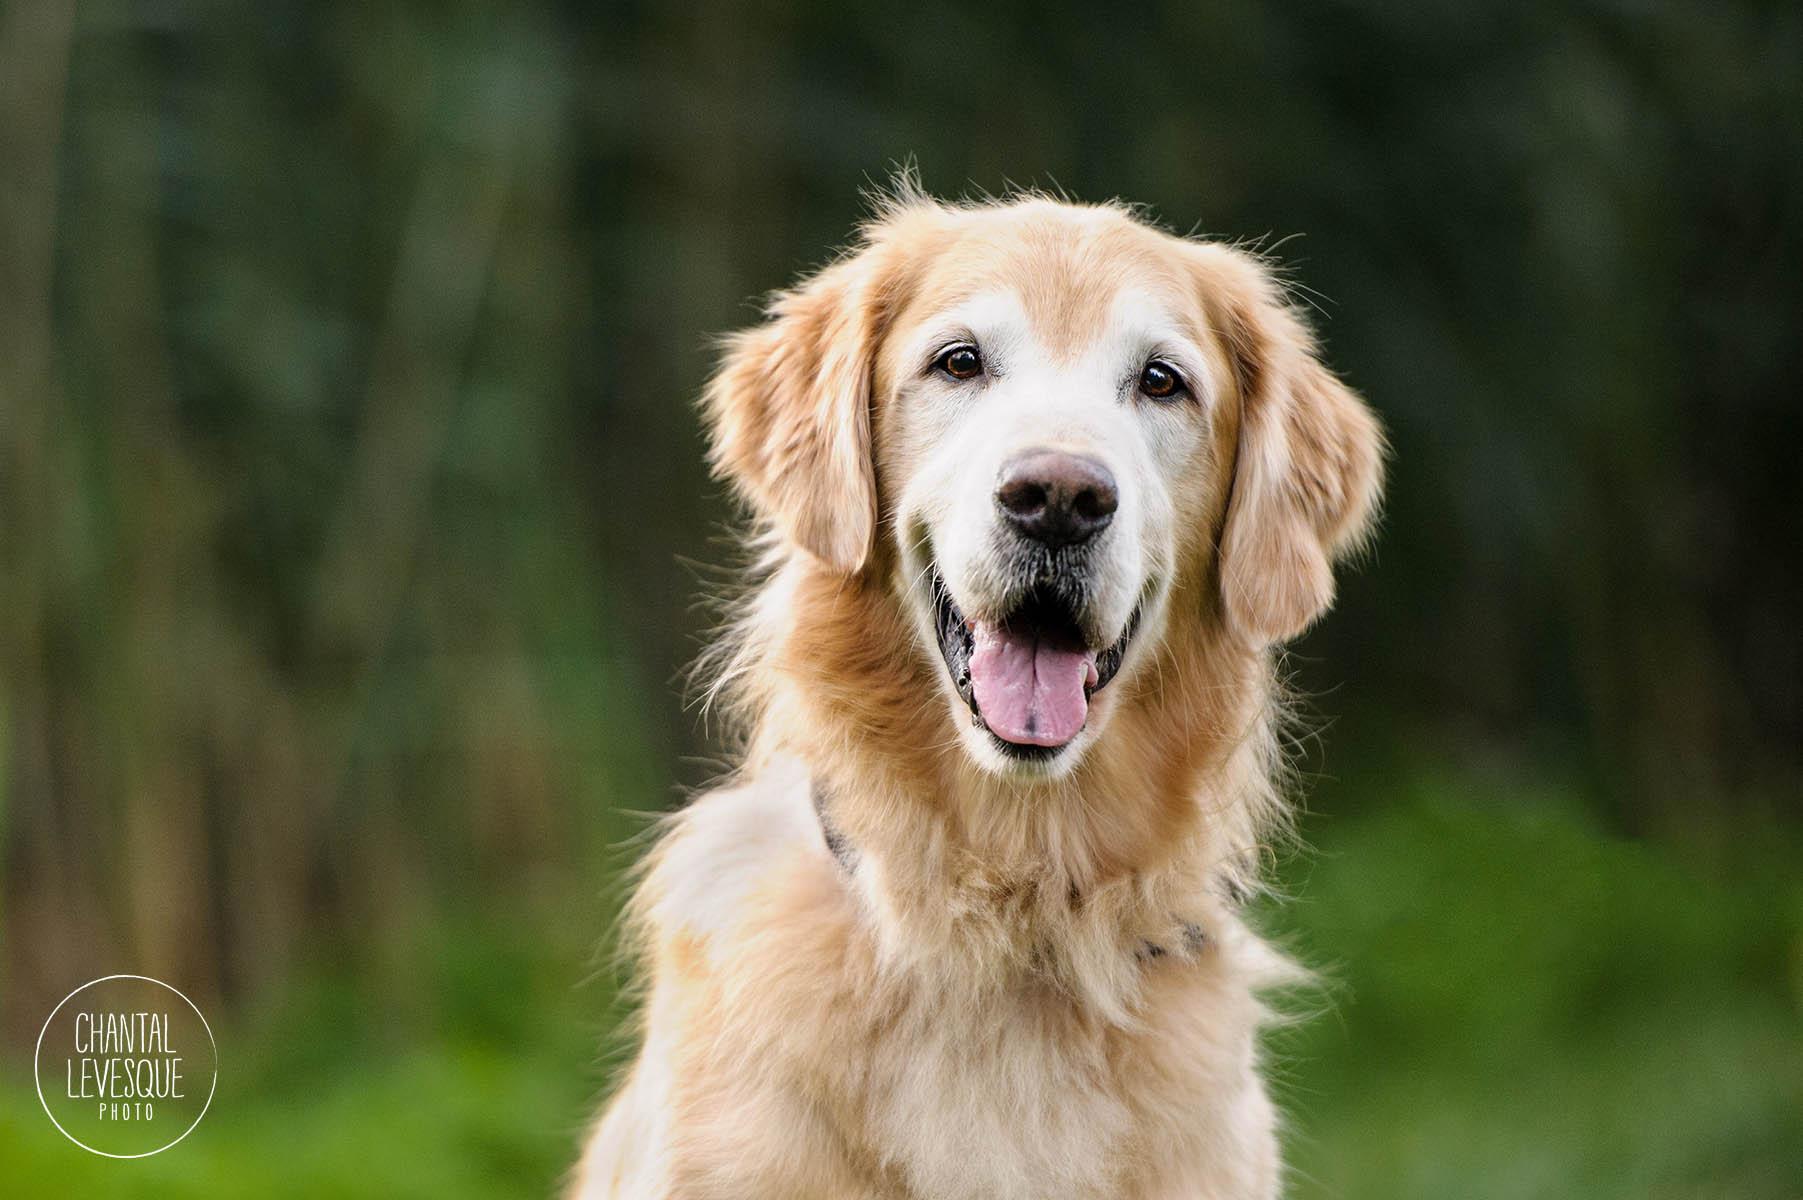 happy-dog-photo